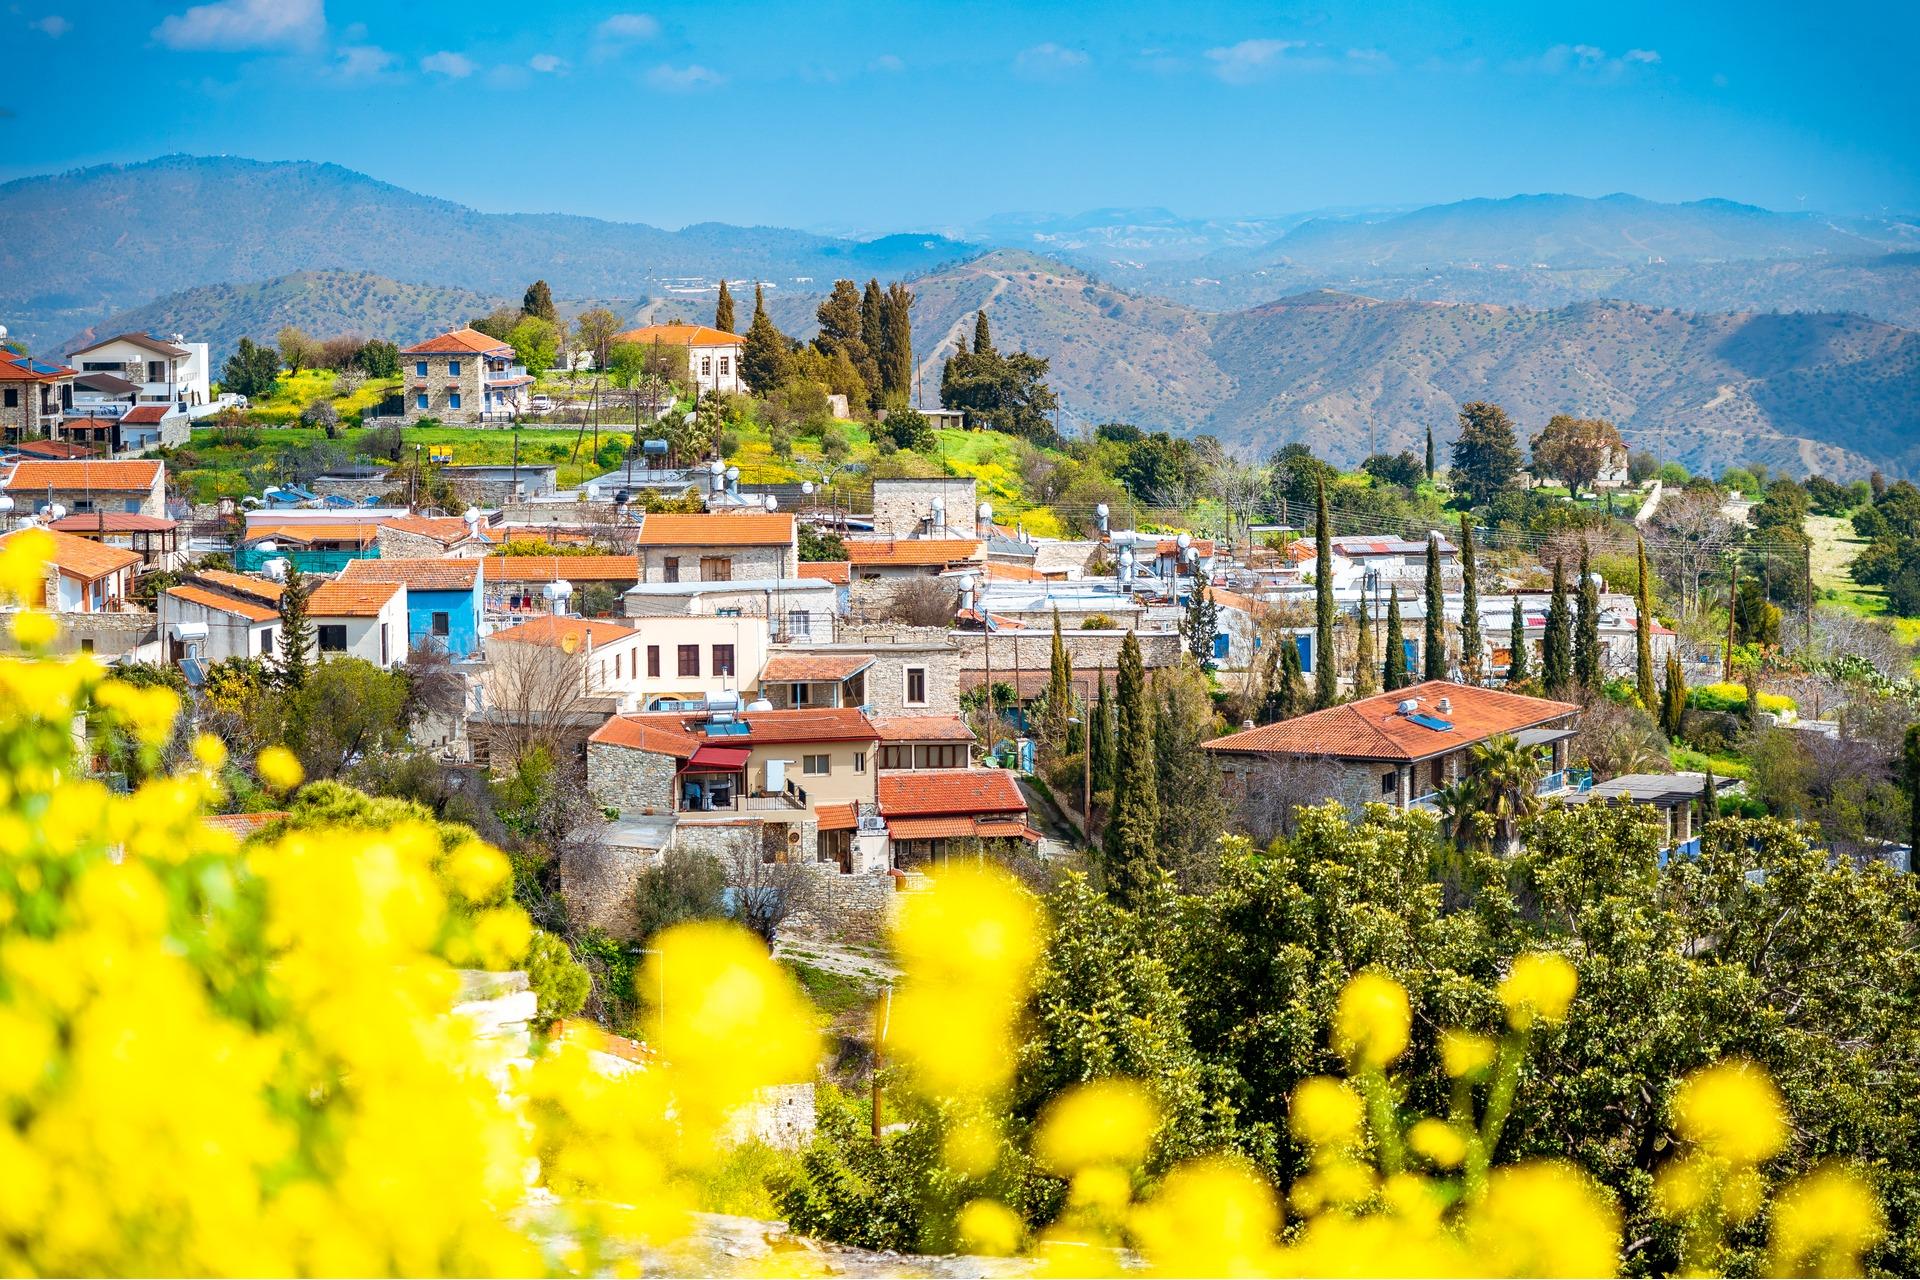 Lefkara Village | Evgeni Fabisuk | Shutterstock